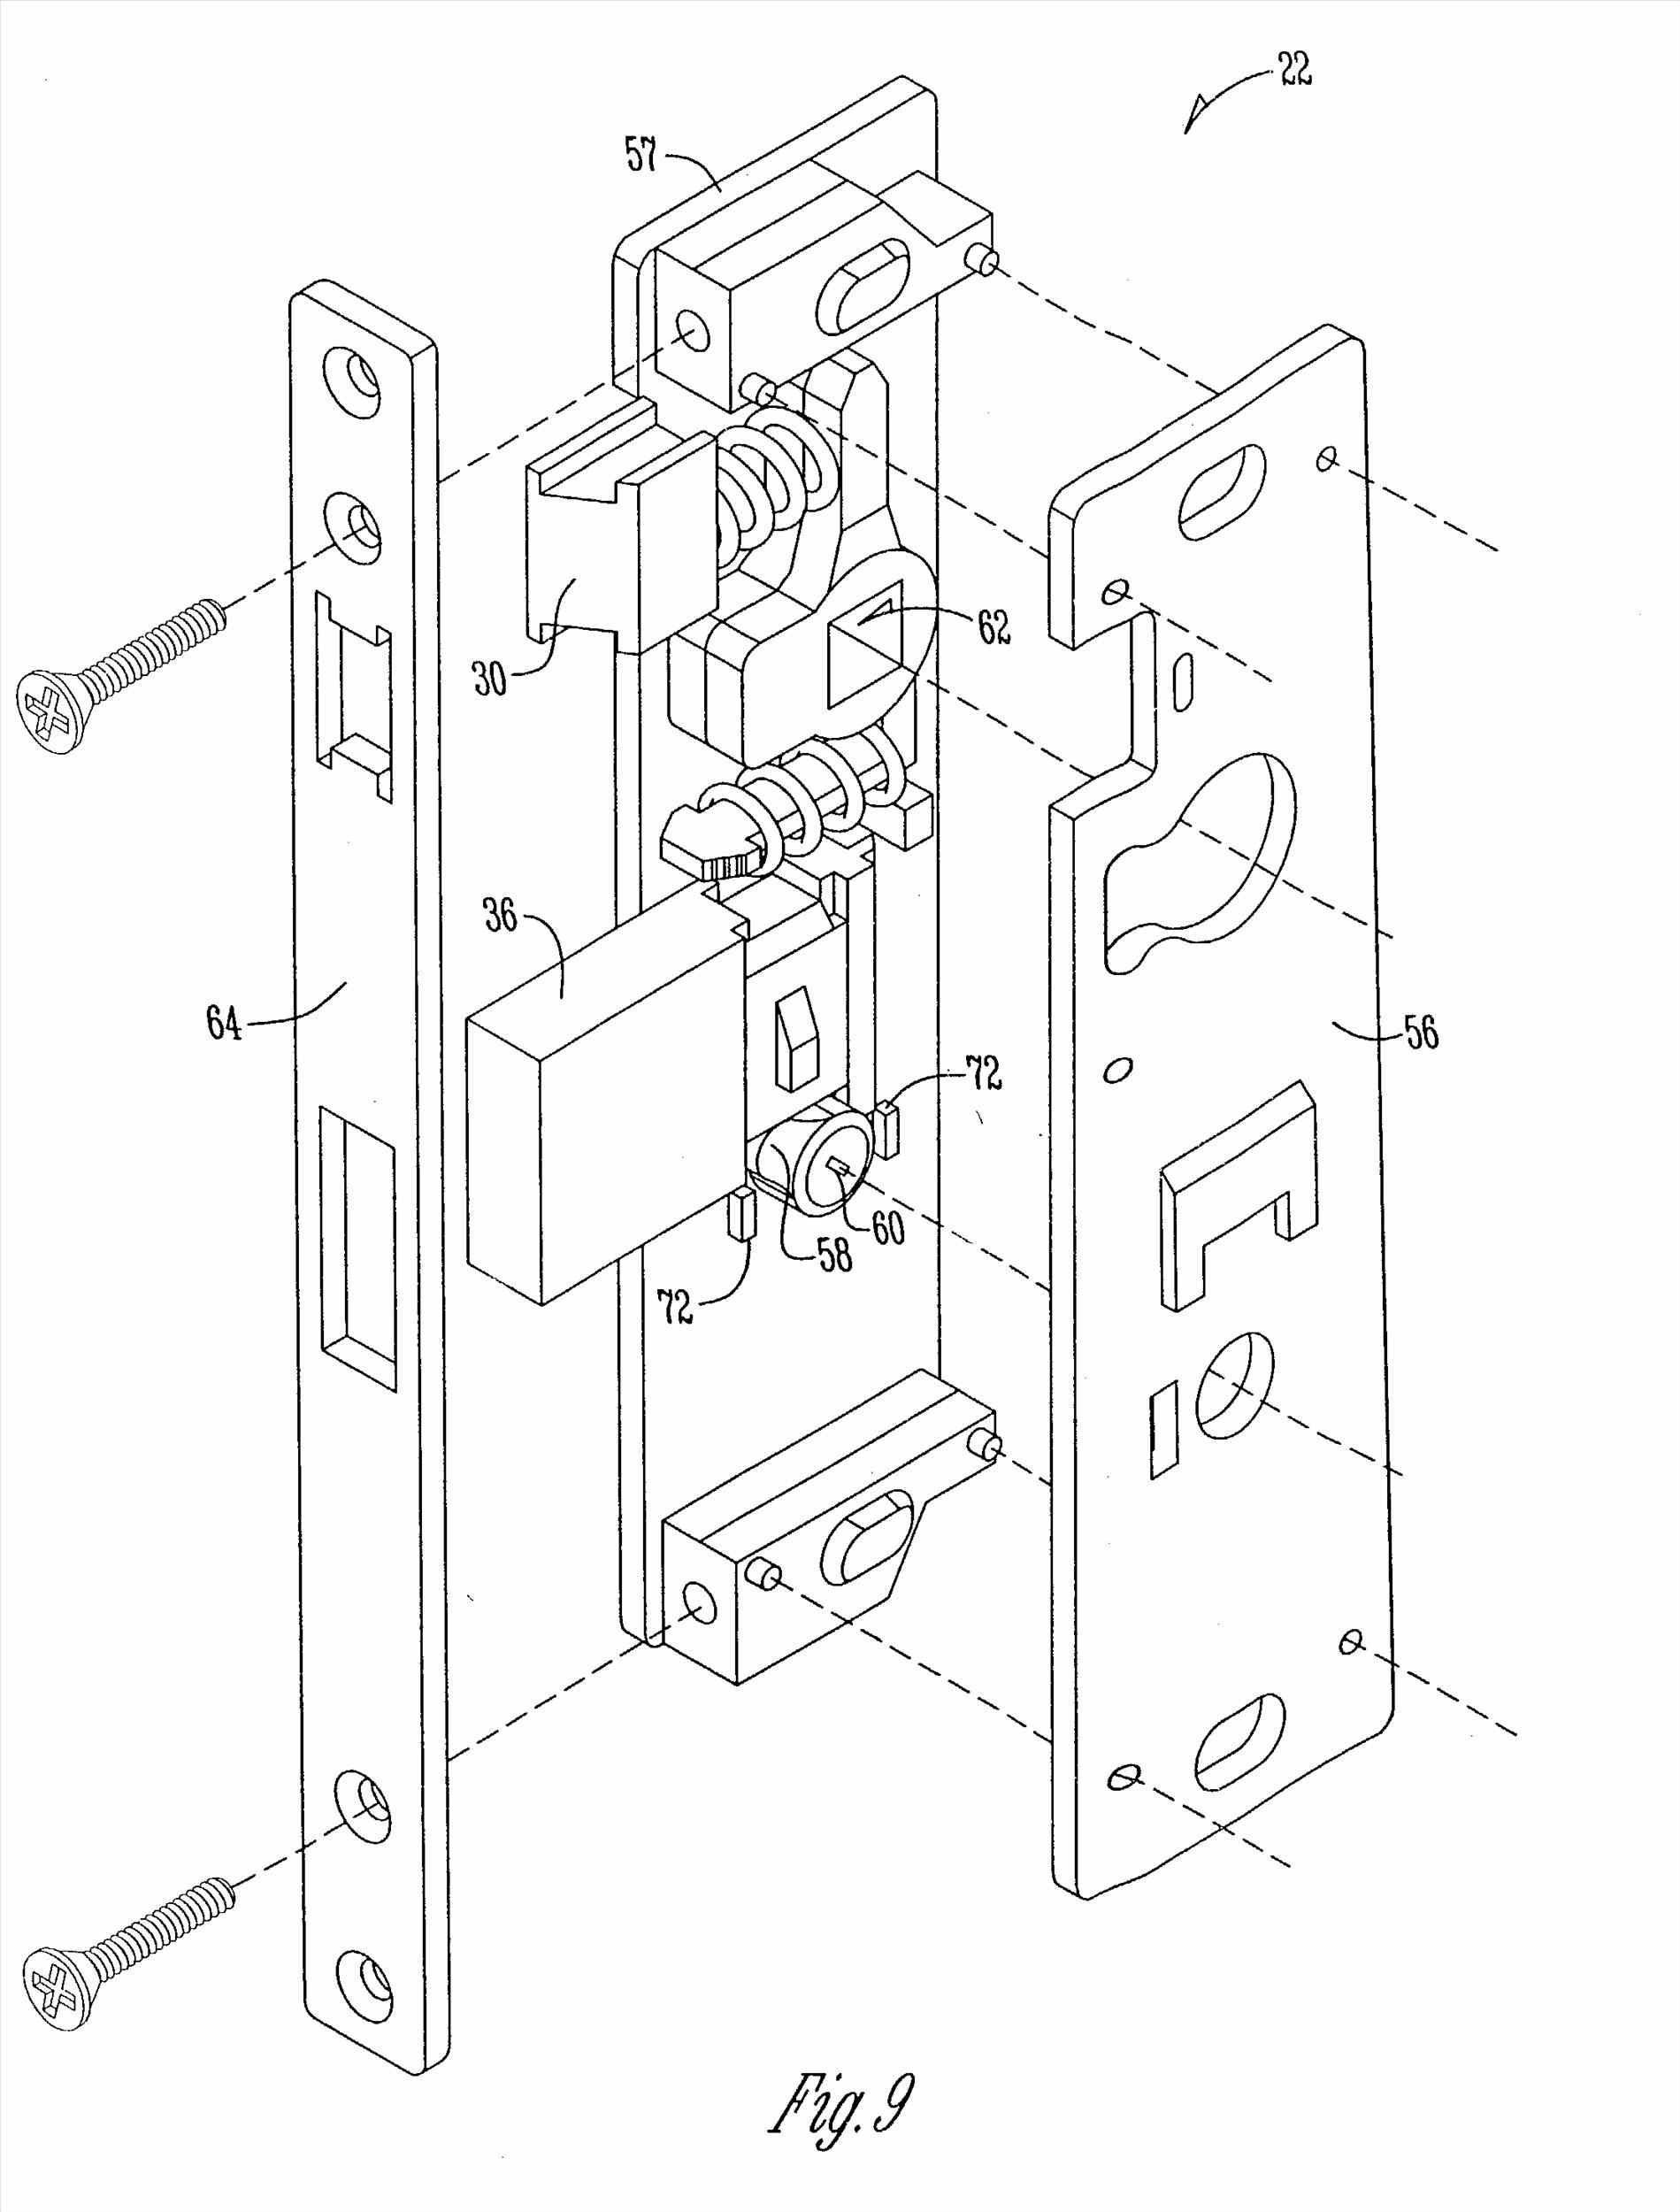 medium resolution of closer parts pella storm door closer parts handle hardinge hlv list hardinge door closer parts hlv parts list storm and screen door